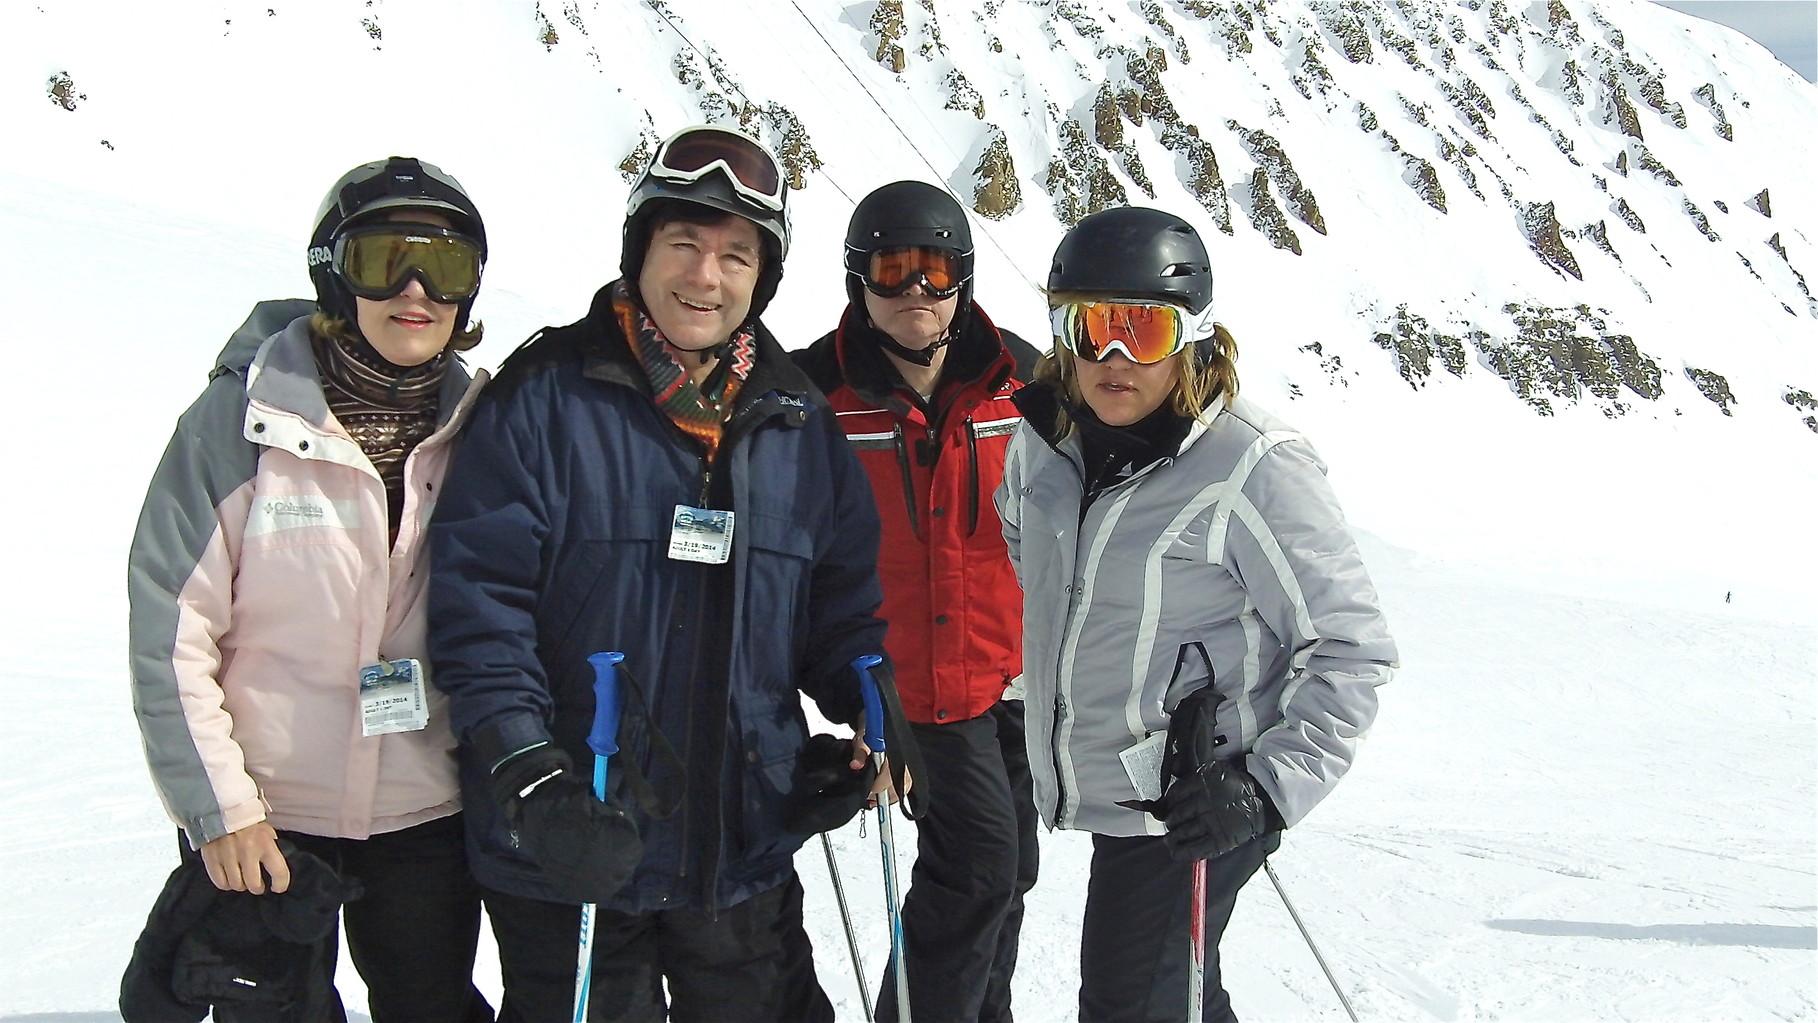 Lorraine, John, Jack Donohue, & Celeste